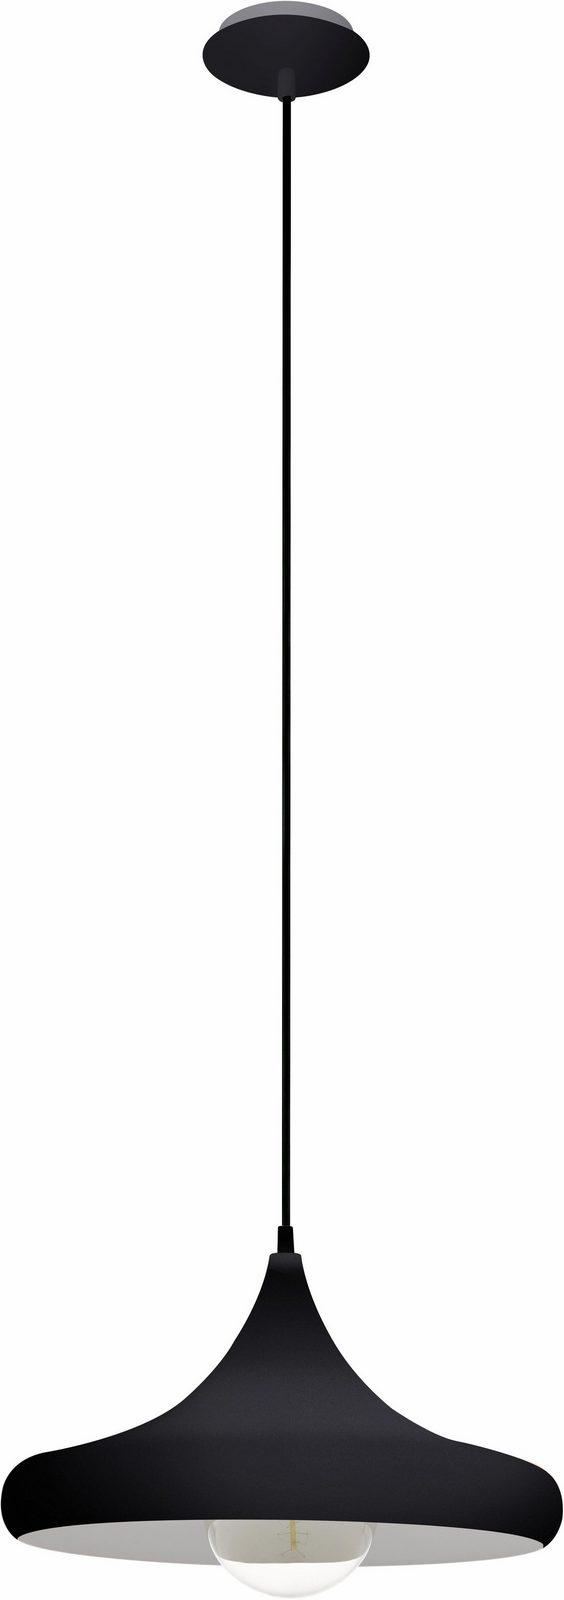 Pendelleuchte, 1-flammig. Ø 40 cm